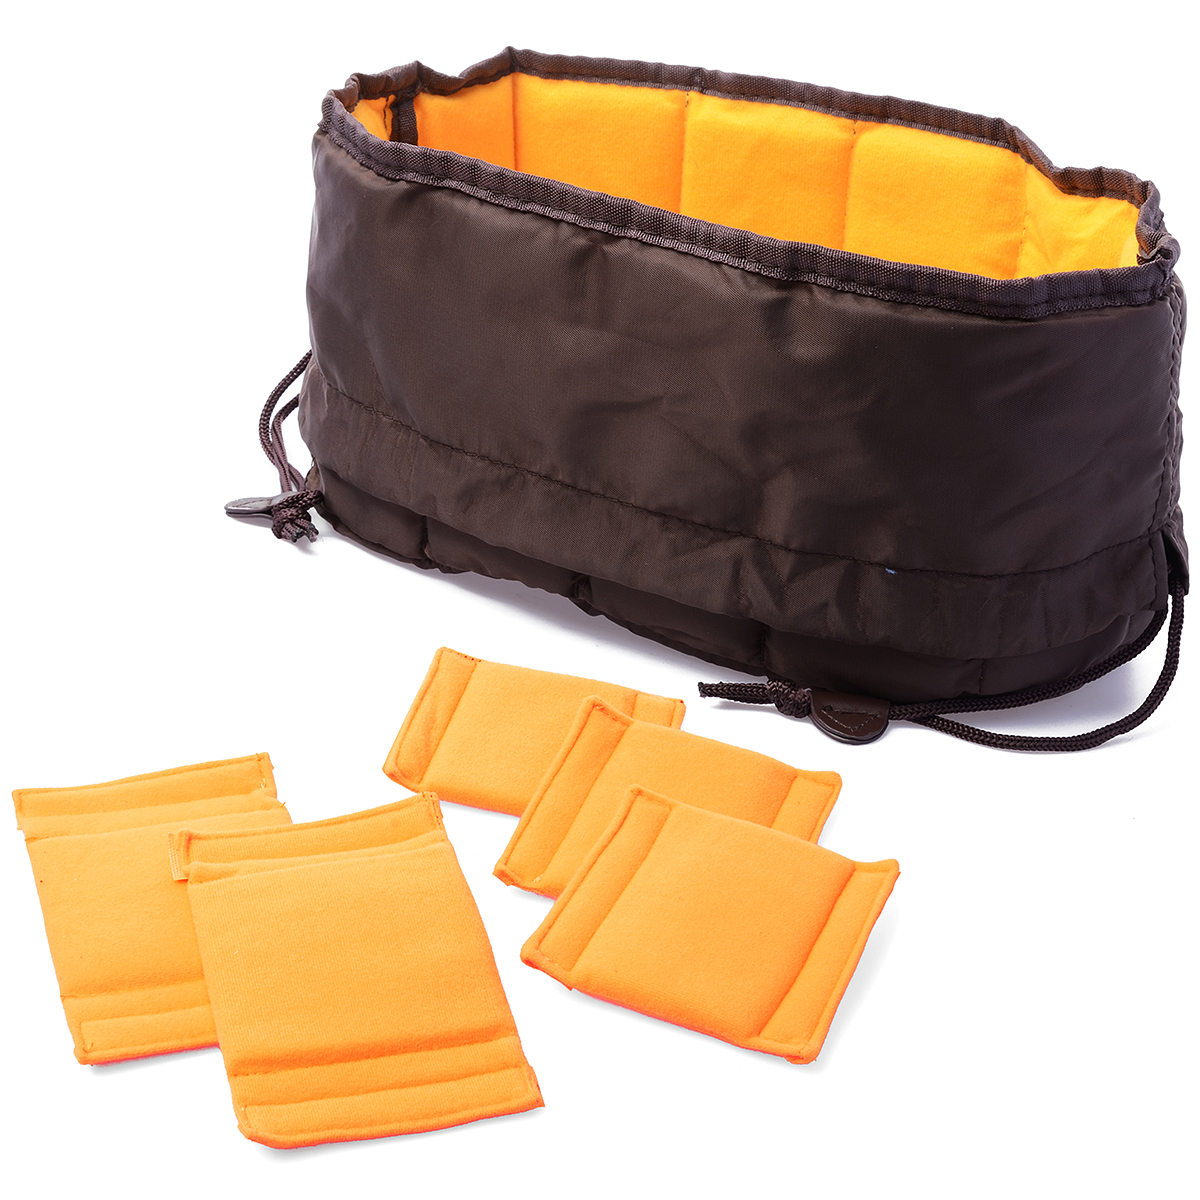 Flexible Camera Insert Partition Padded Bag Case for Canon DSLR SLR Lens LF381(China (Mainland))